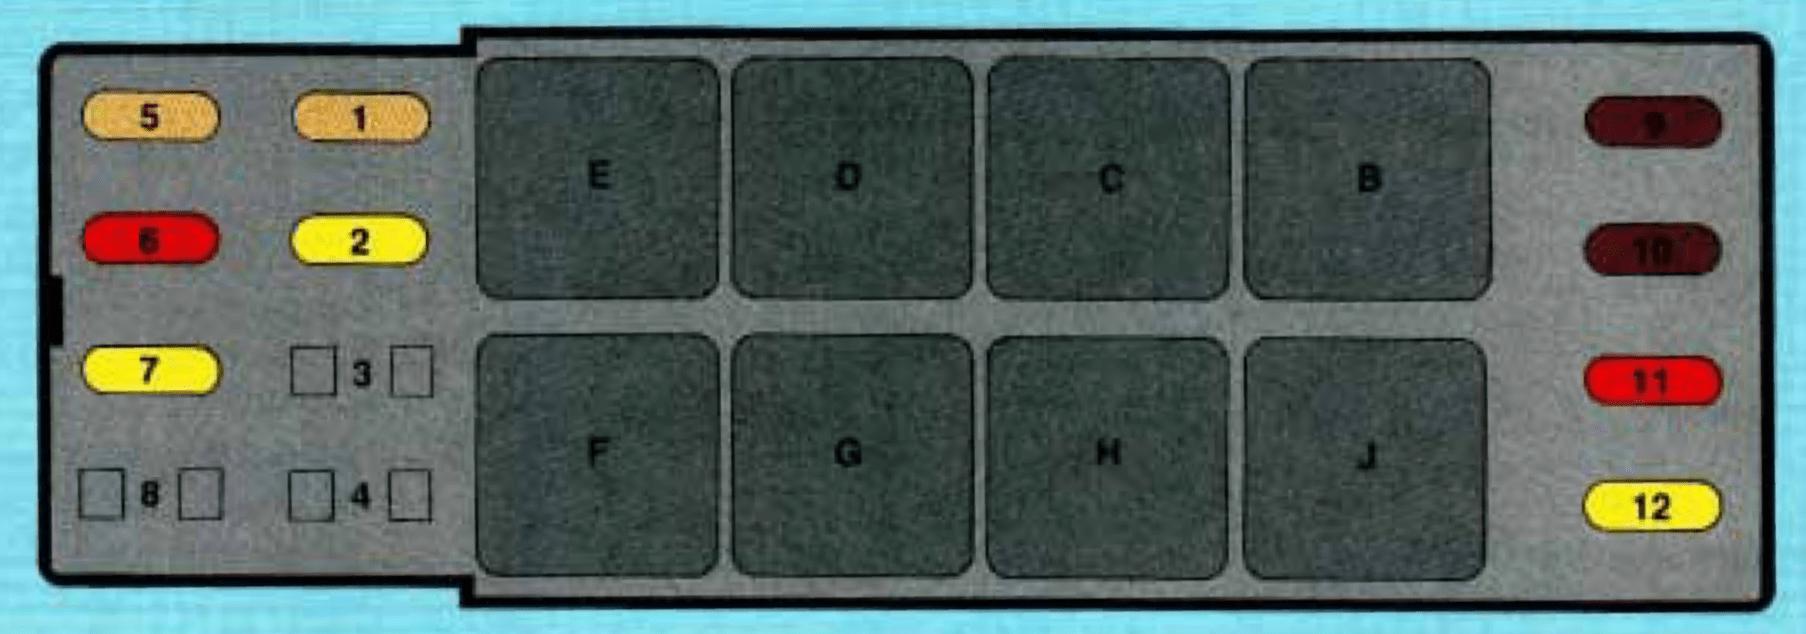 hight resolution of chevrolet camaro 1993 fuse box diagram